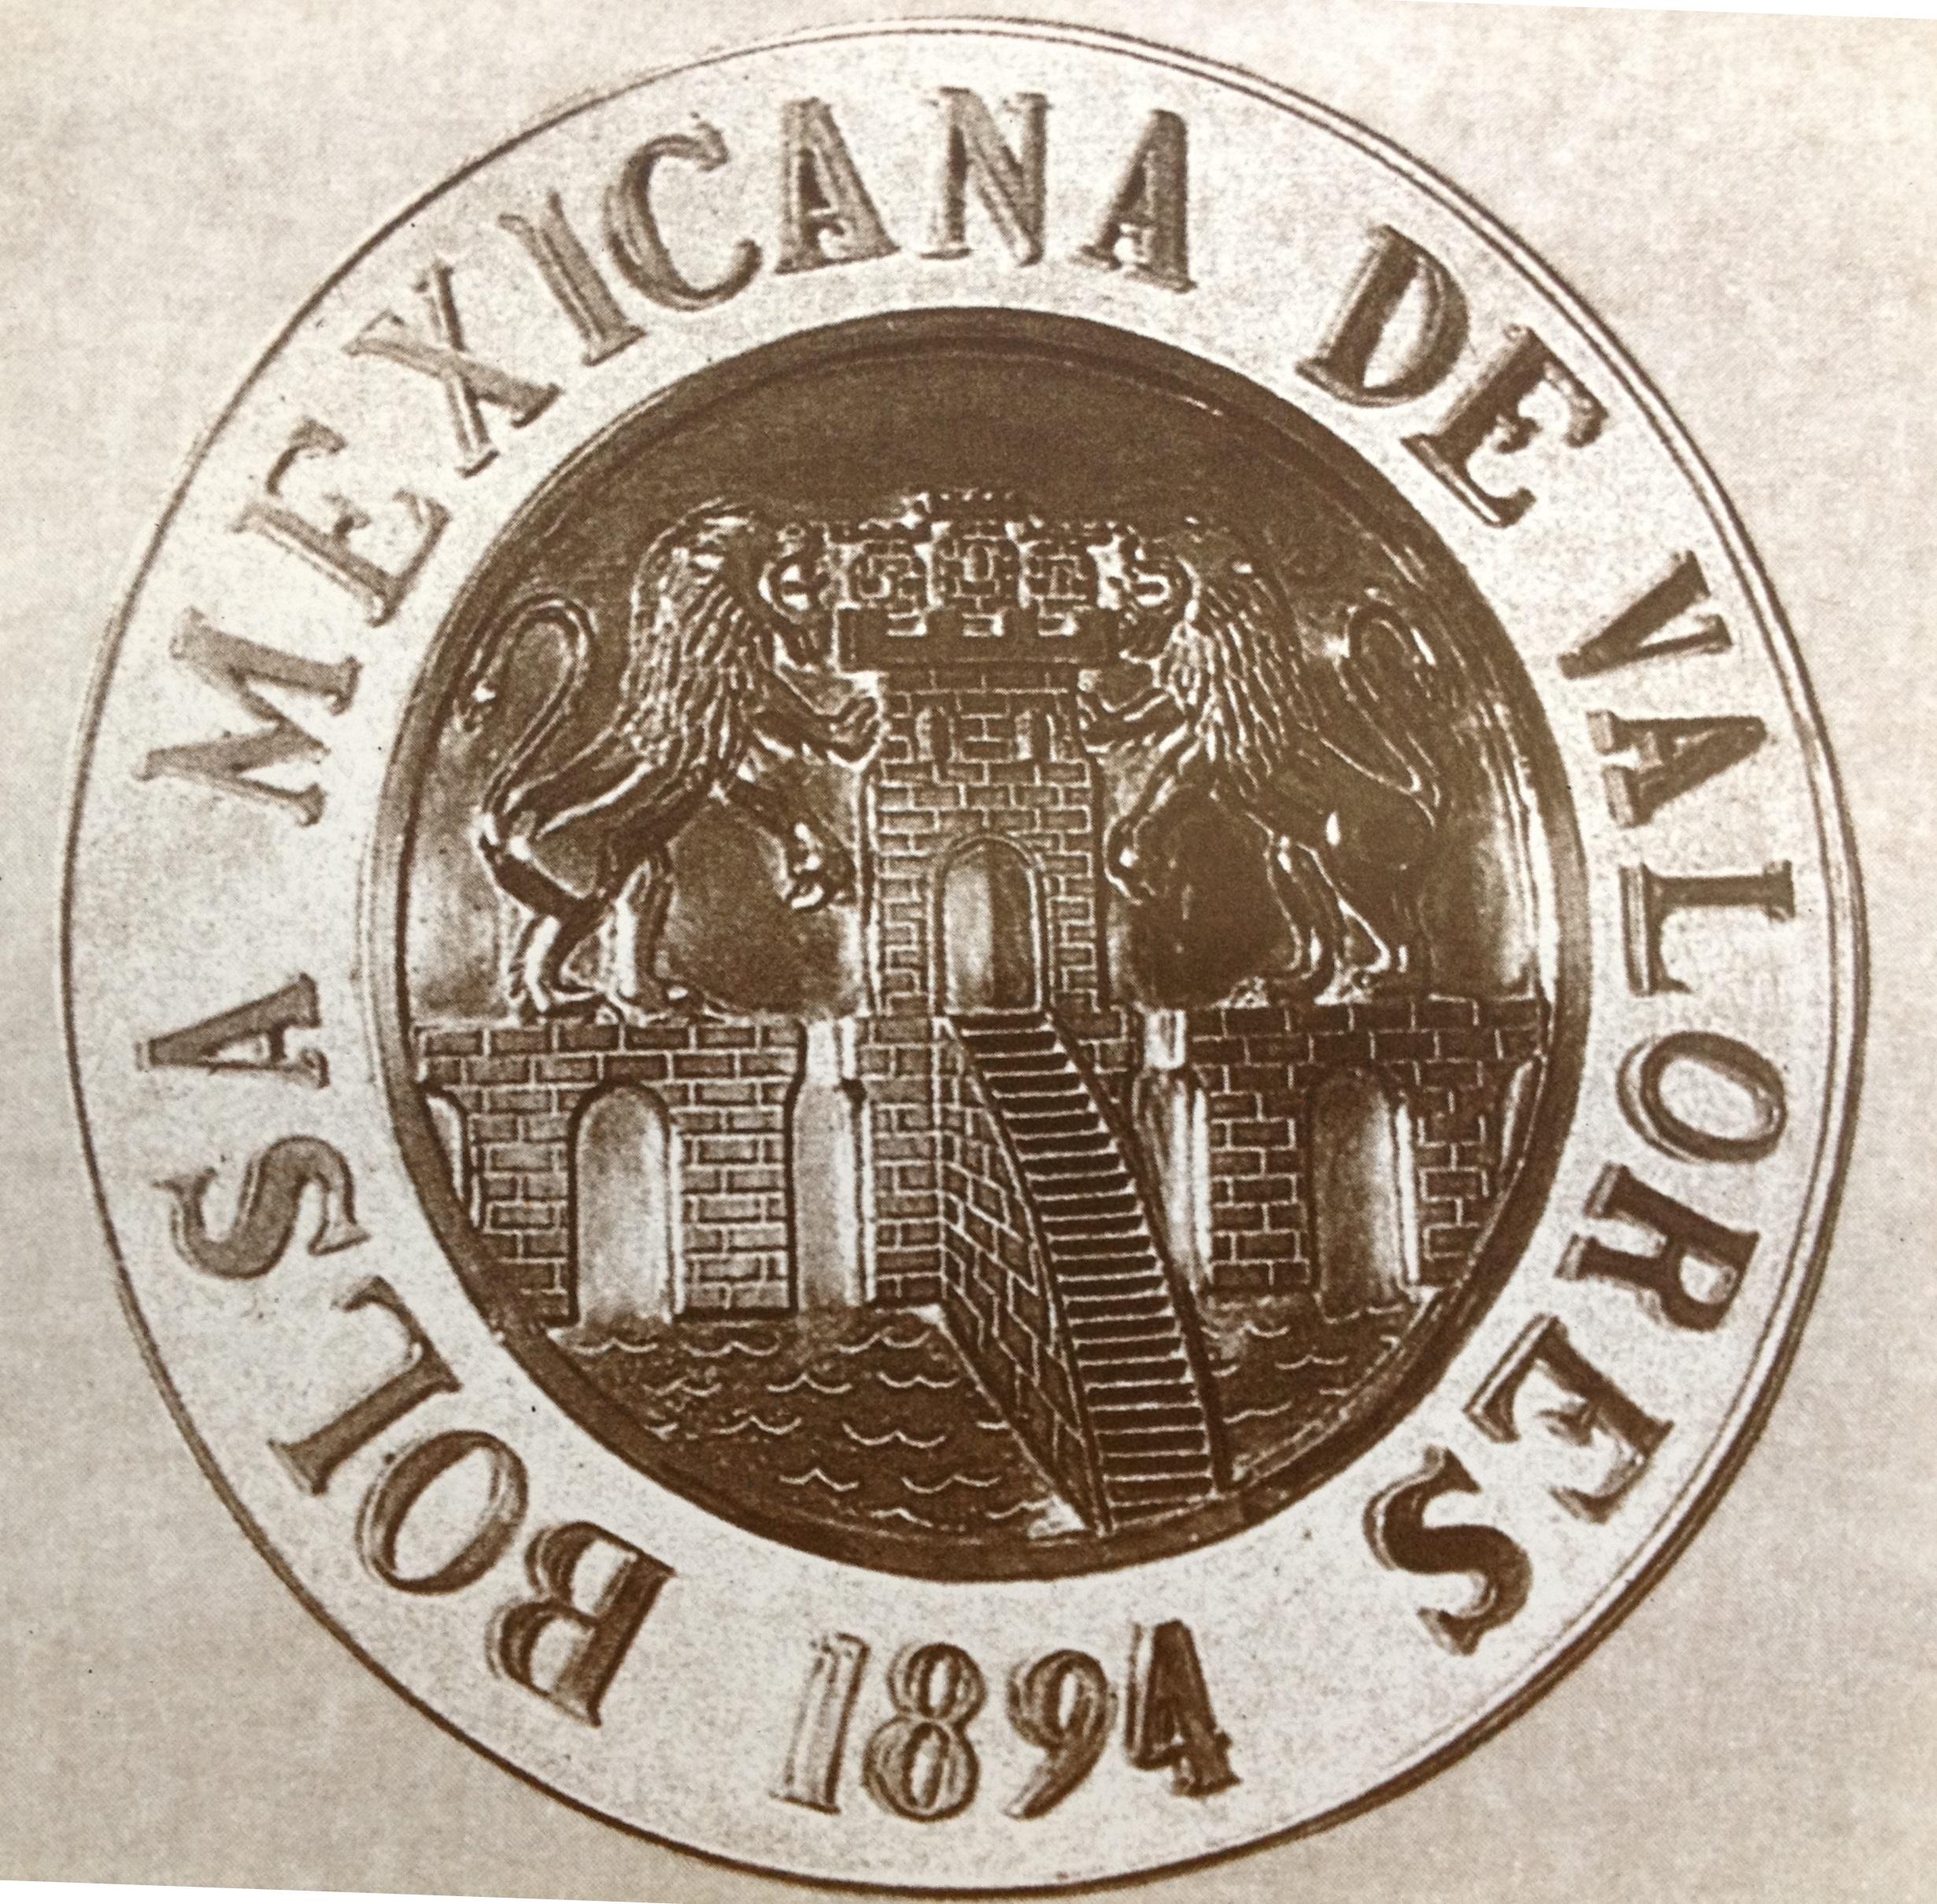 Libre La Bolsa jpg Archivo WikipediaEnciclopedia nace Nacional 5cRSAL34jq